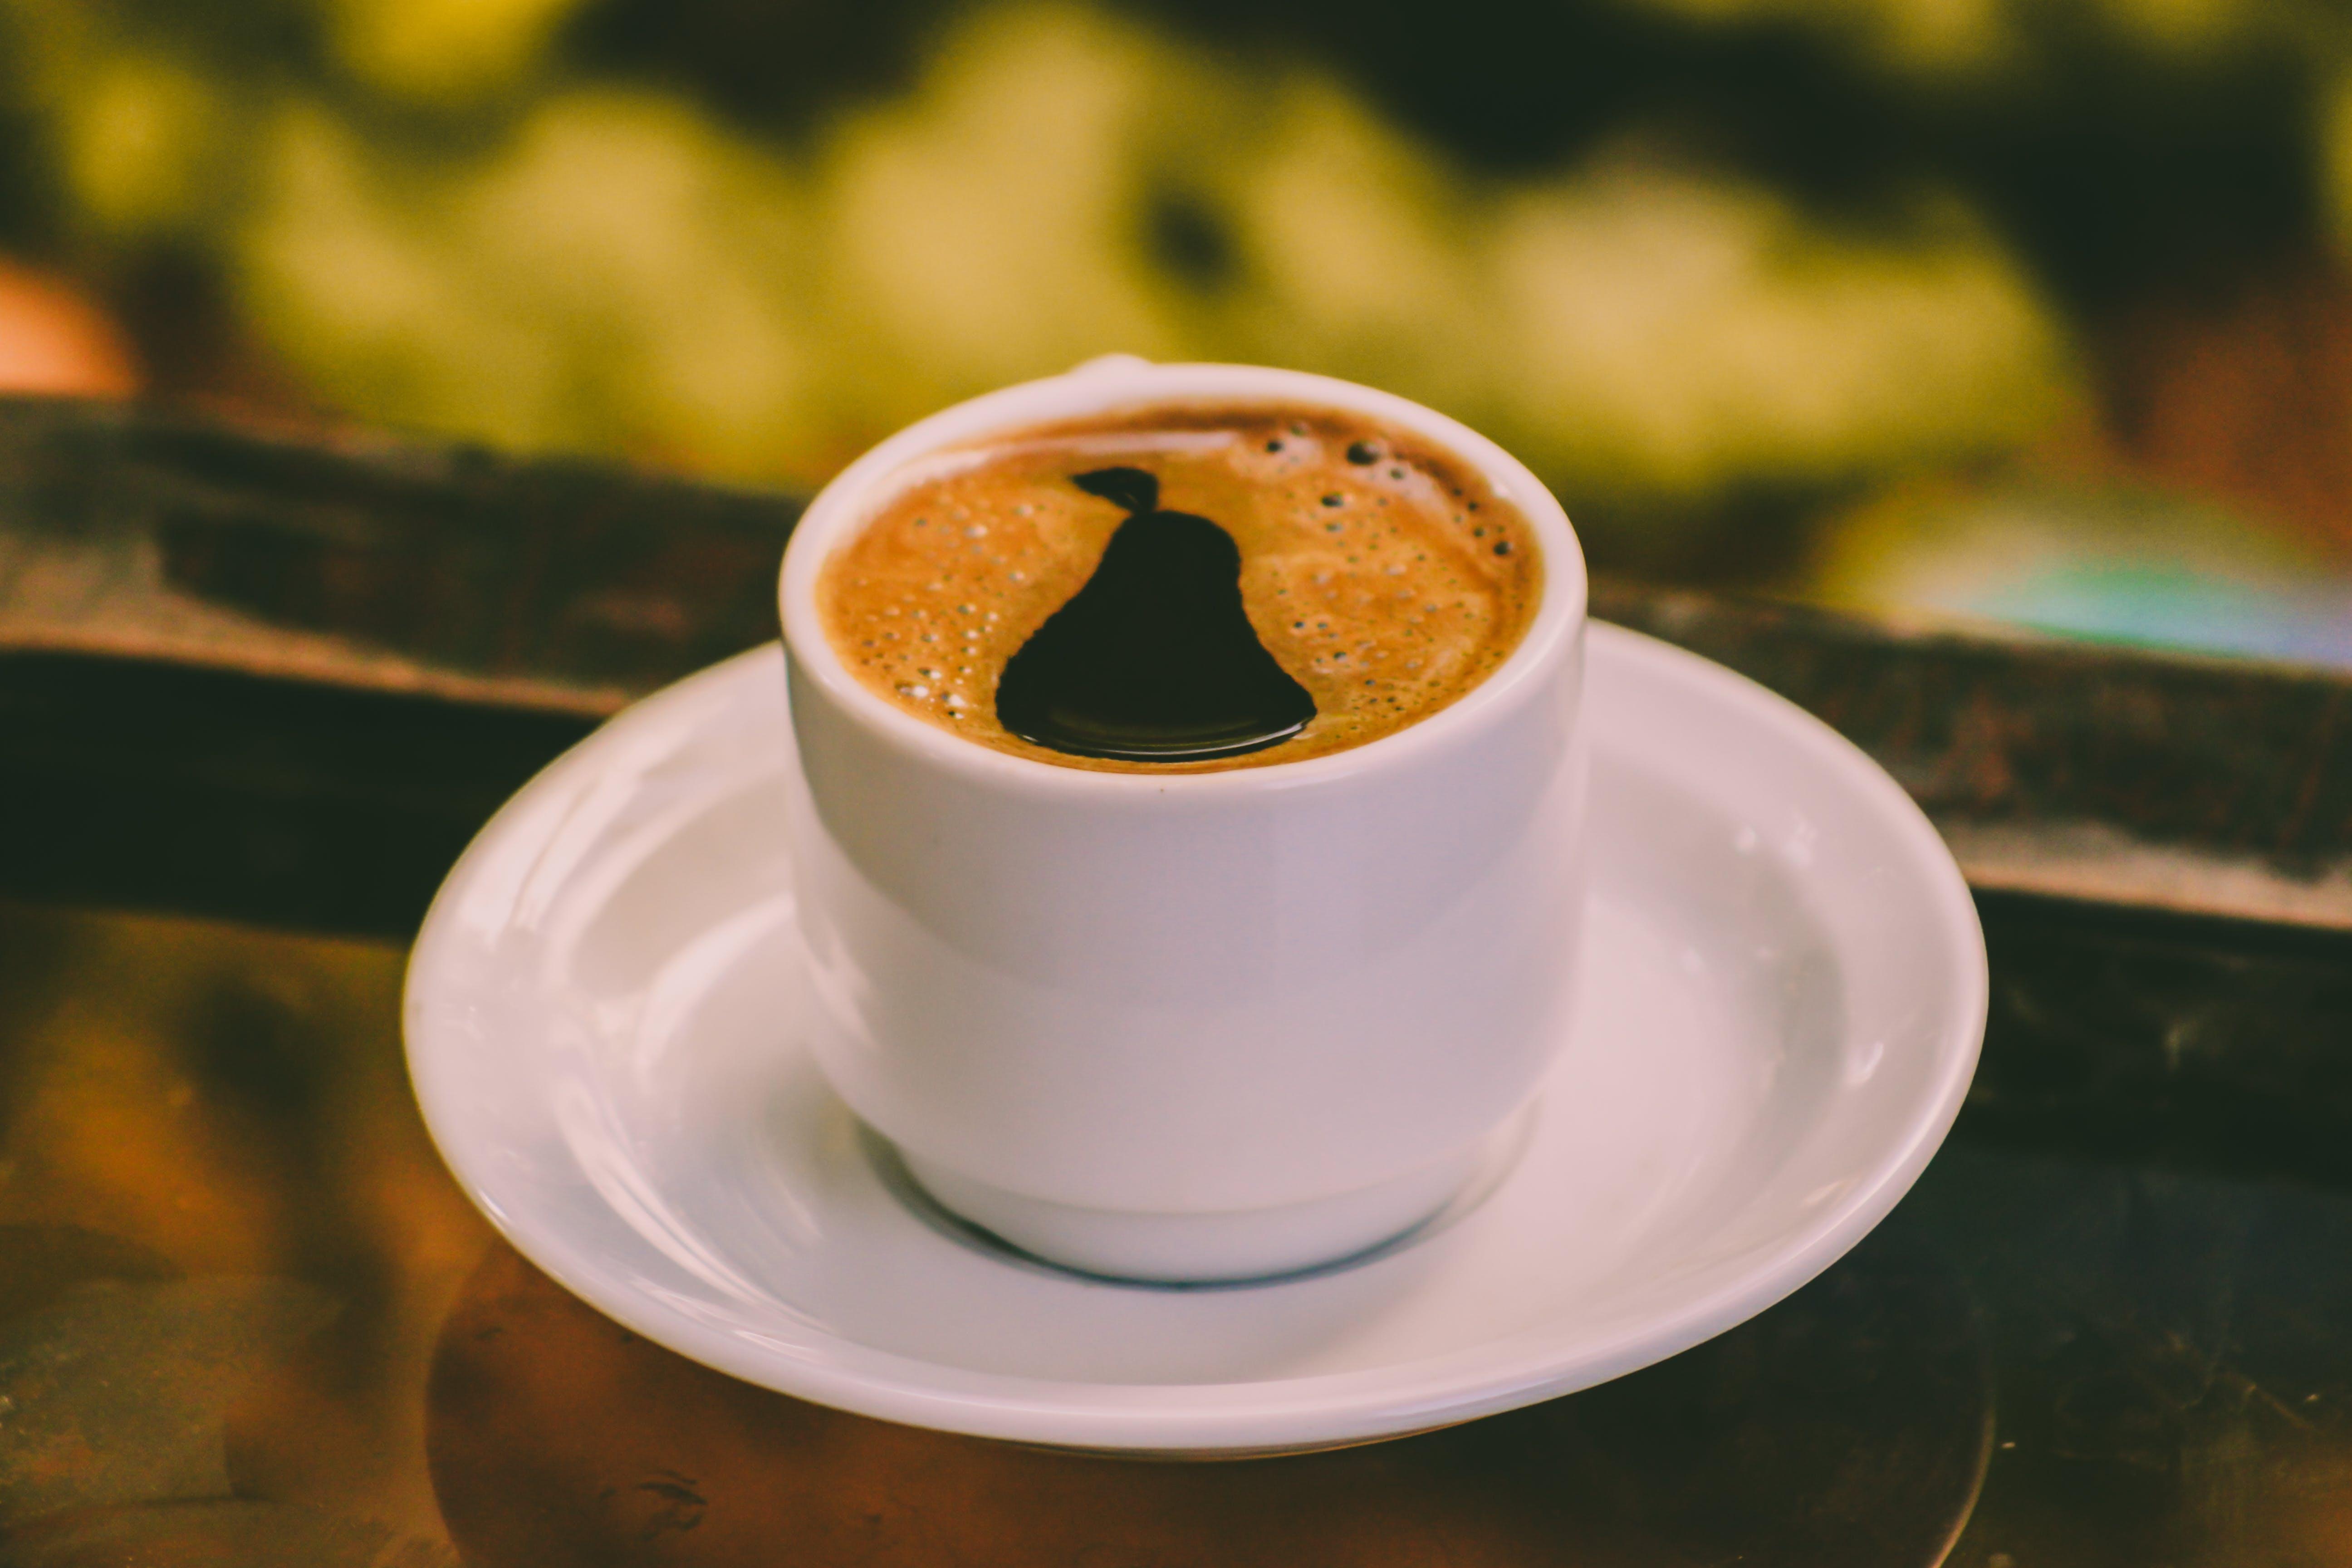 Fotos de stock gratuitas de atractivo, beber, café, café negro